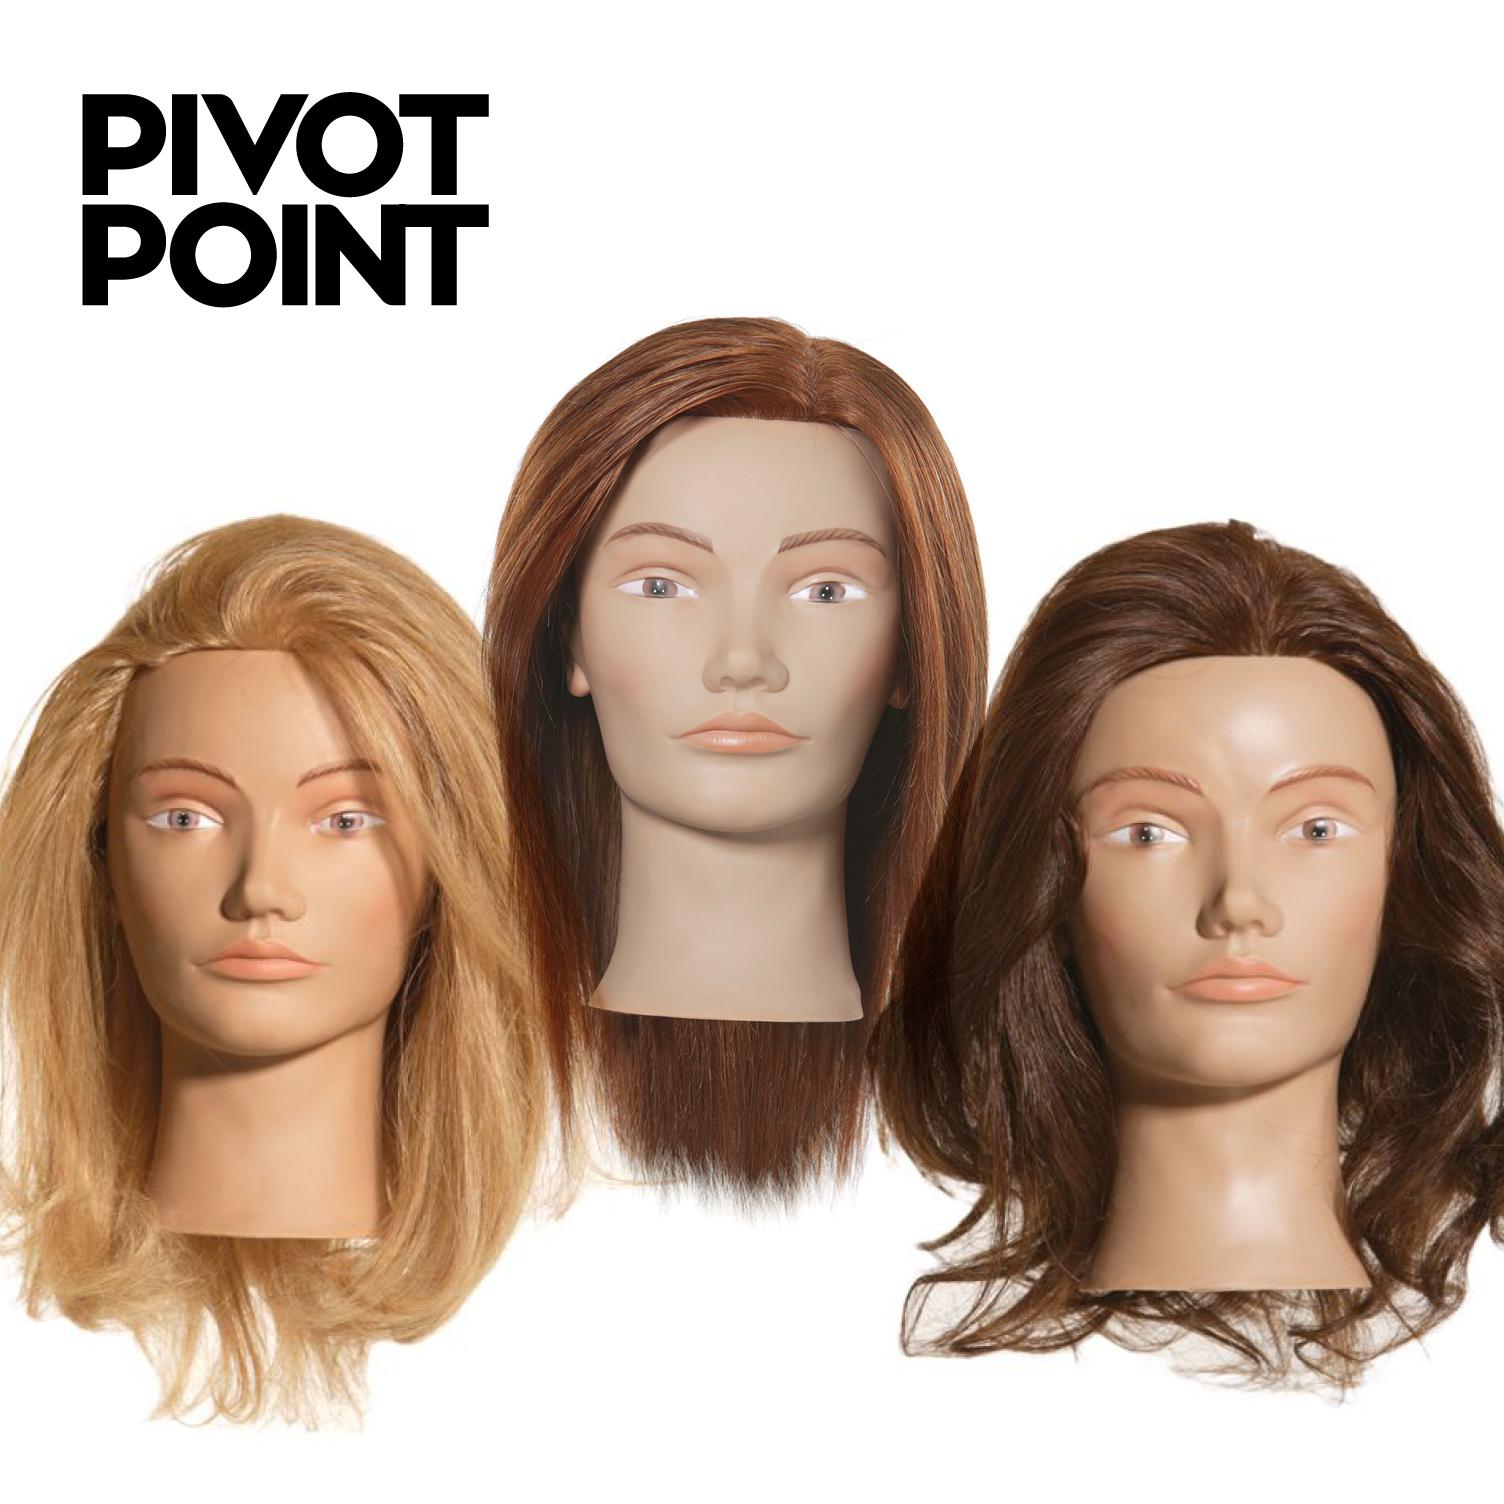 Pivot Point Training Heads